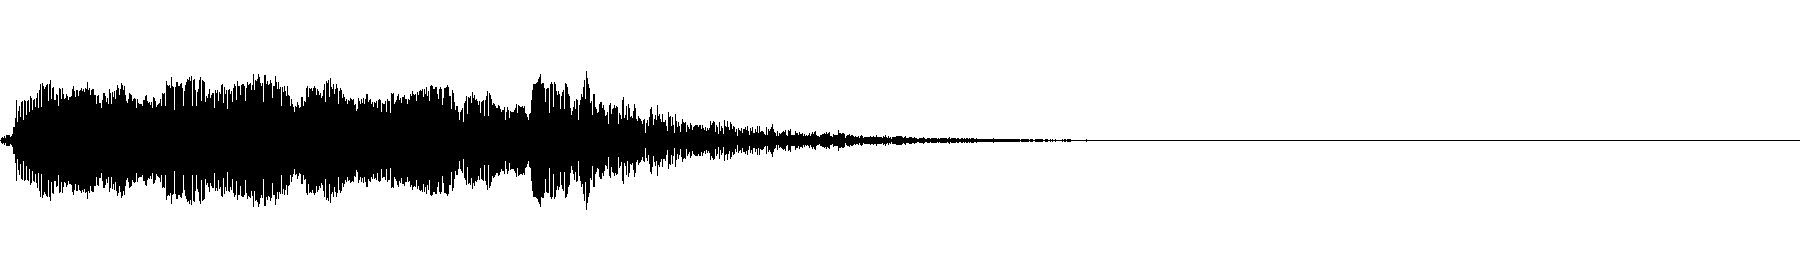 vox 65